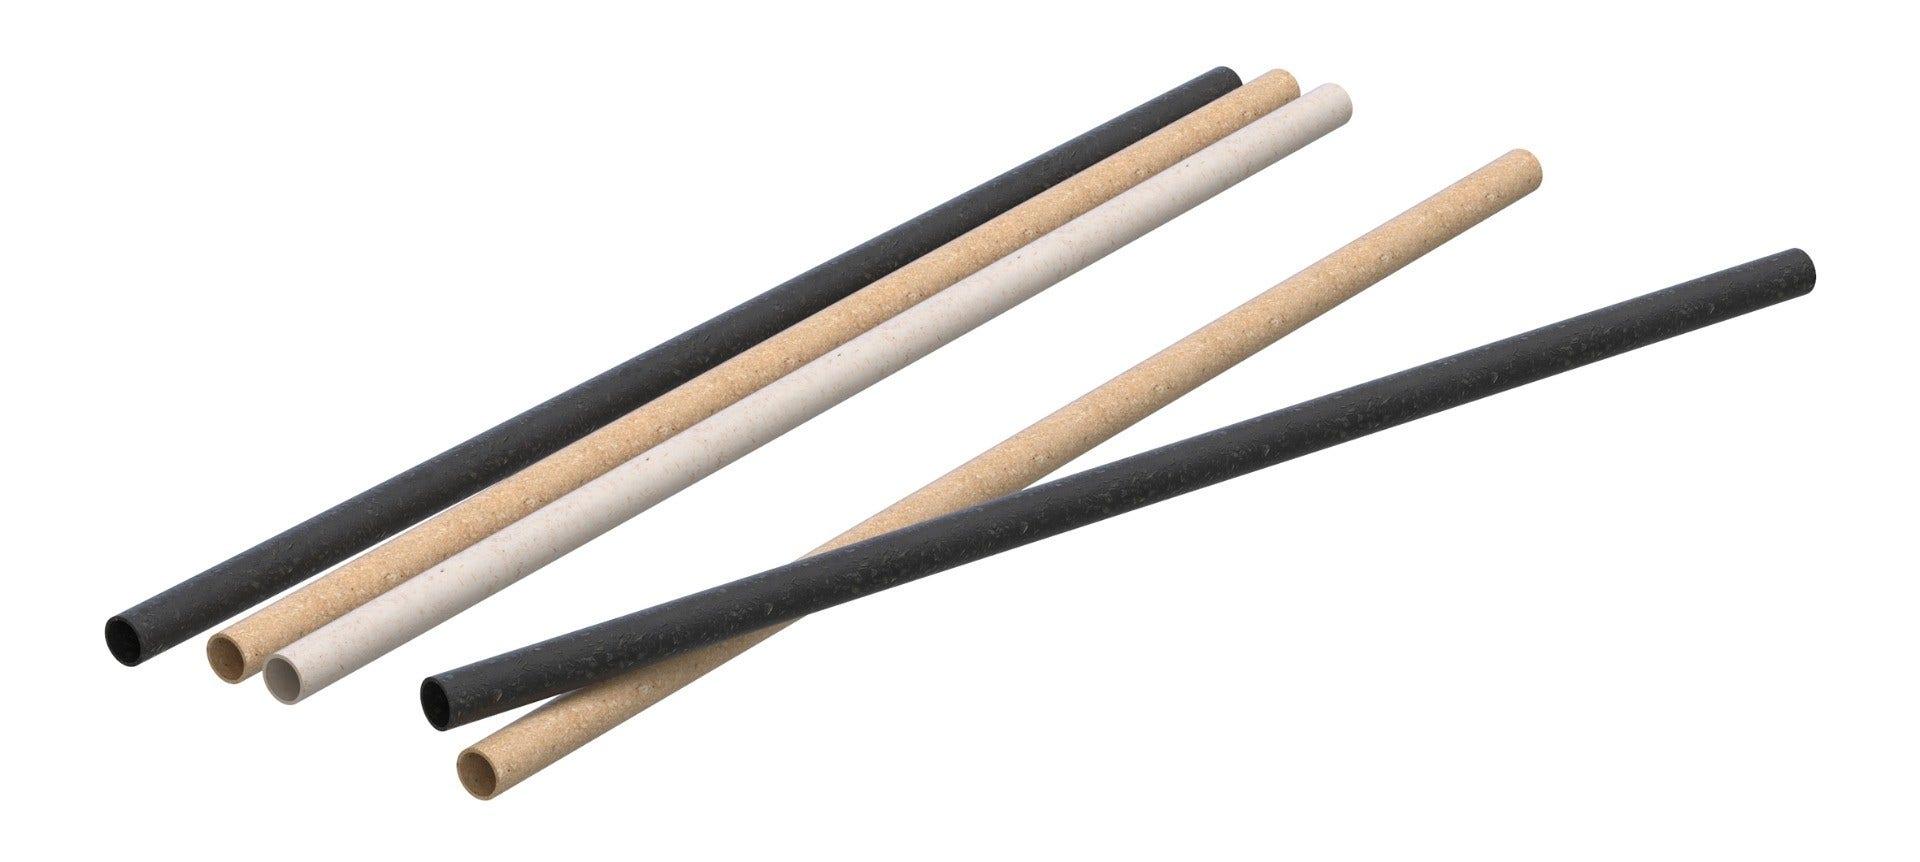 Sulapac straws